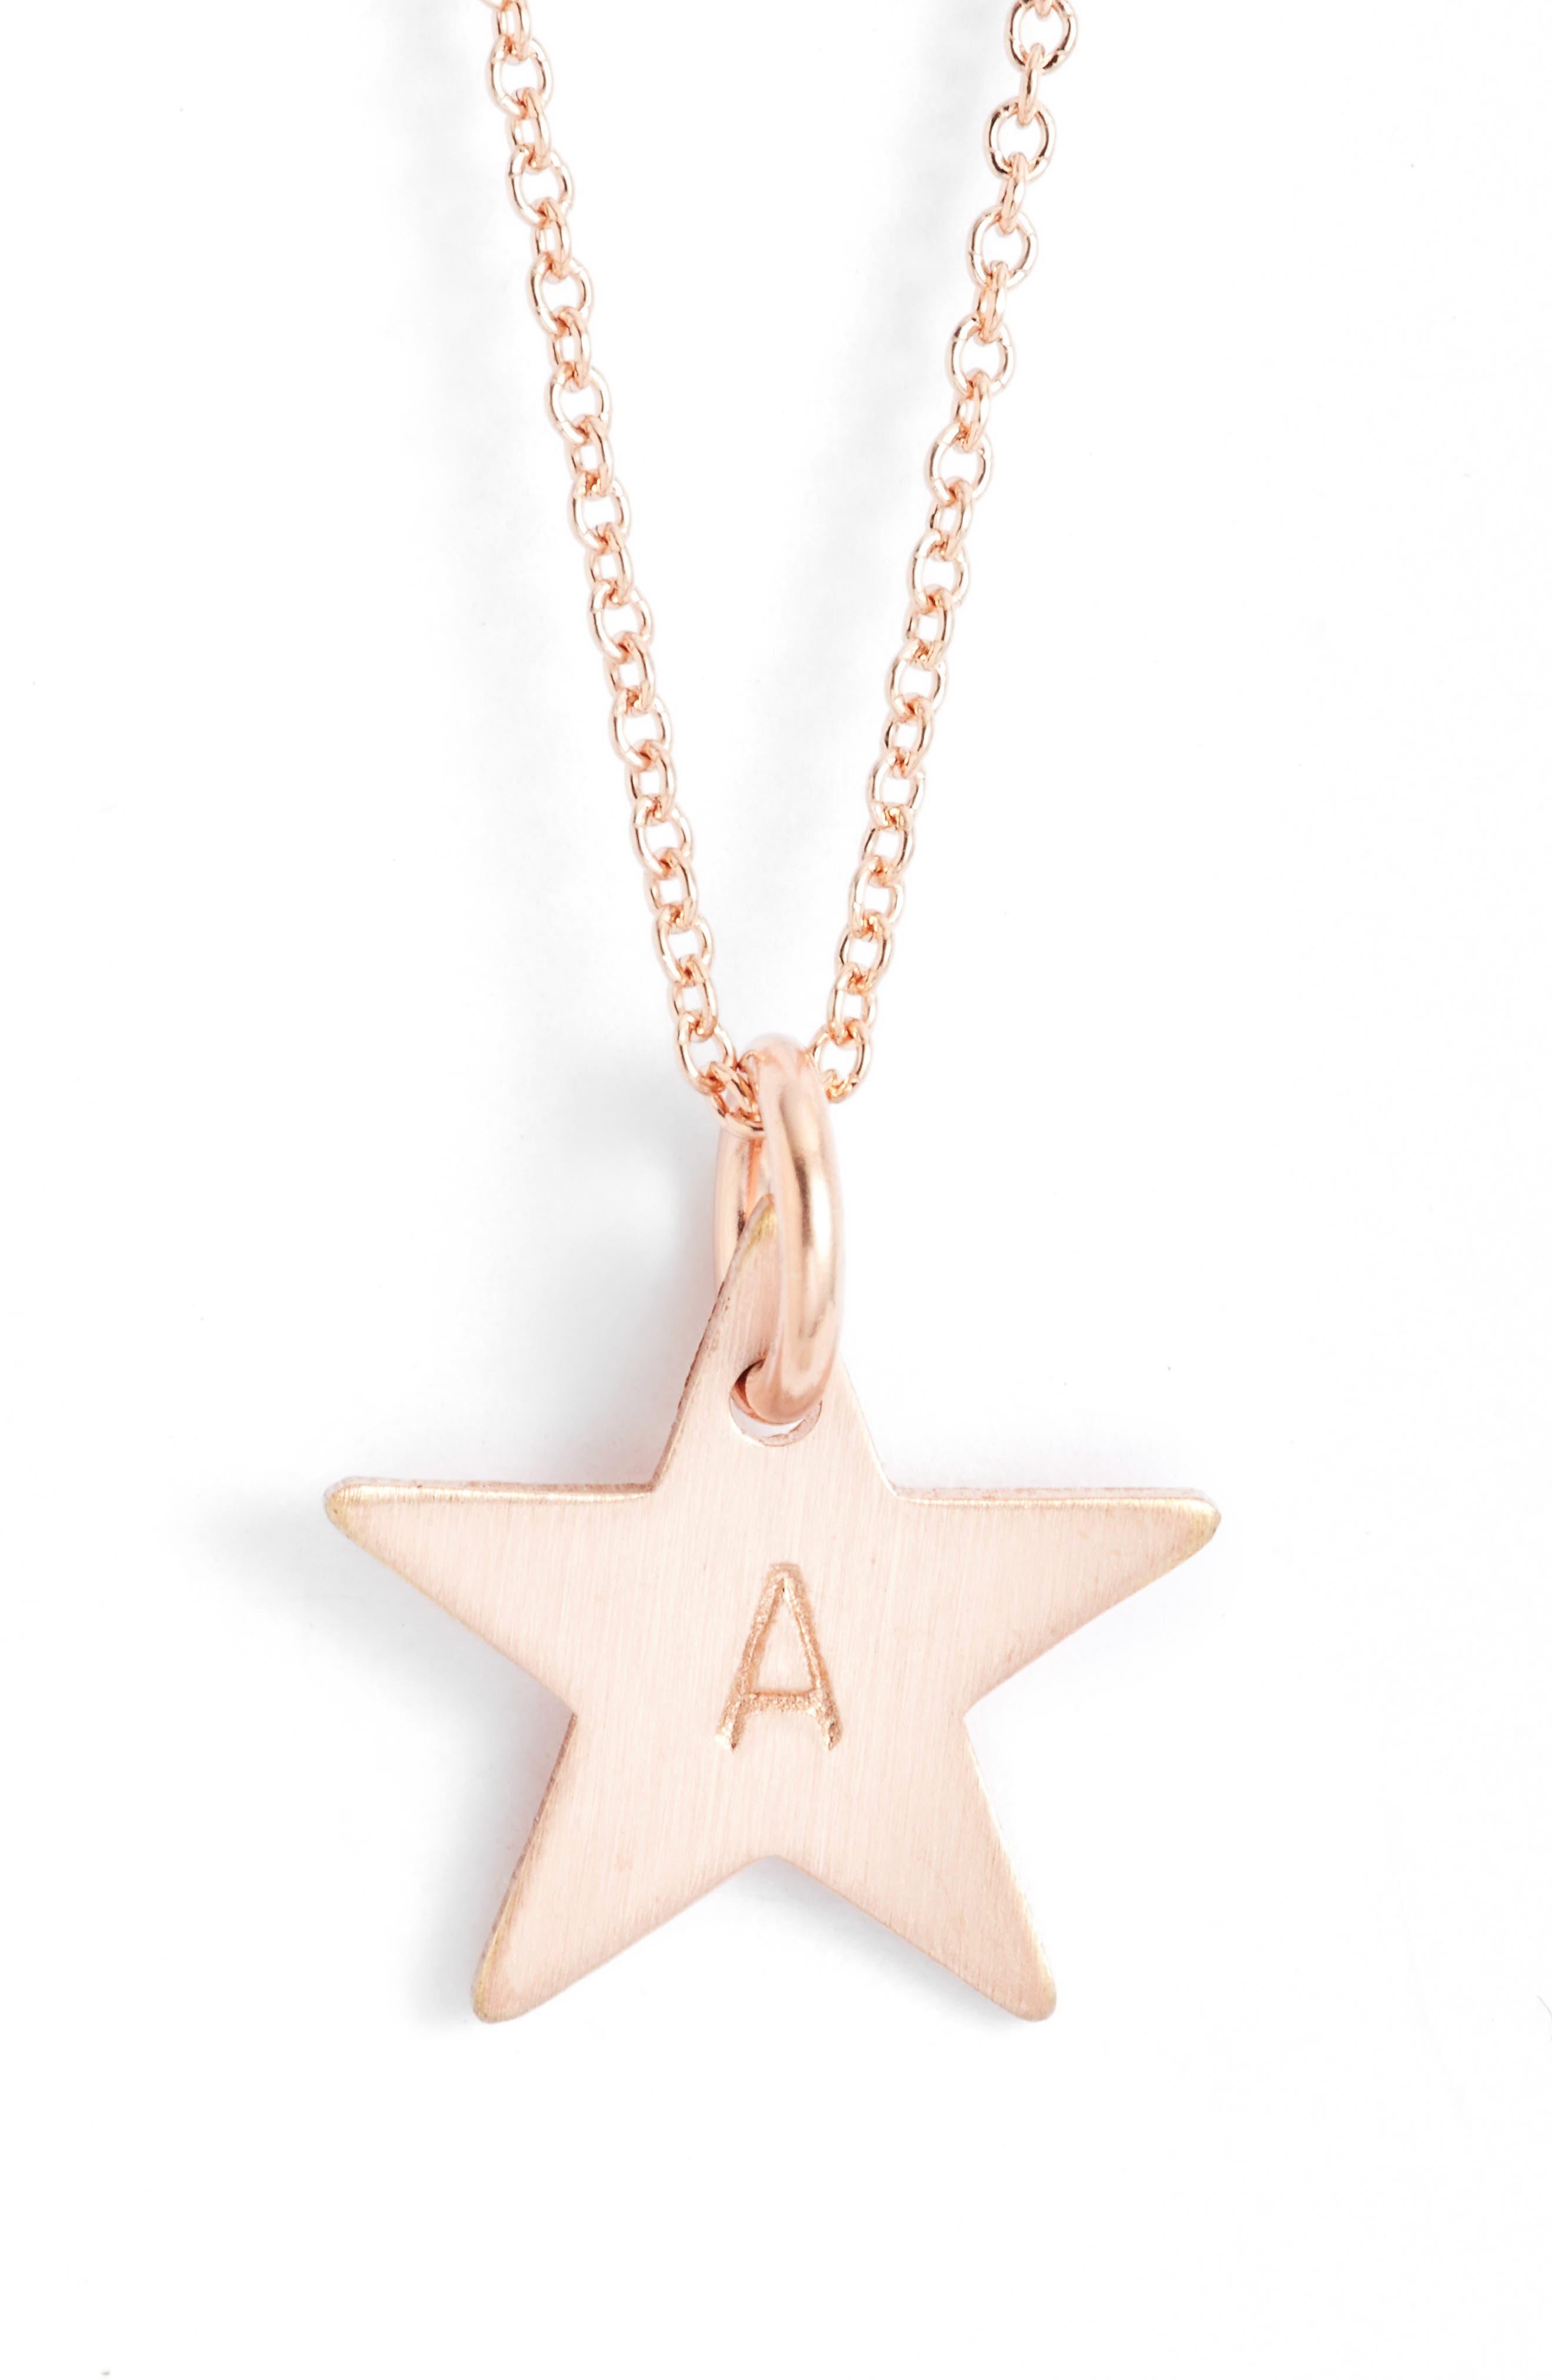 14k-Rose Gold Fill Initial Mini Star Pendant Necklace,                             Main thumbnail 1, color,                             710